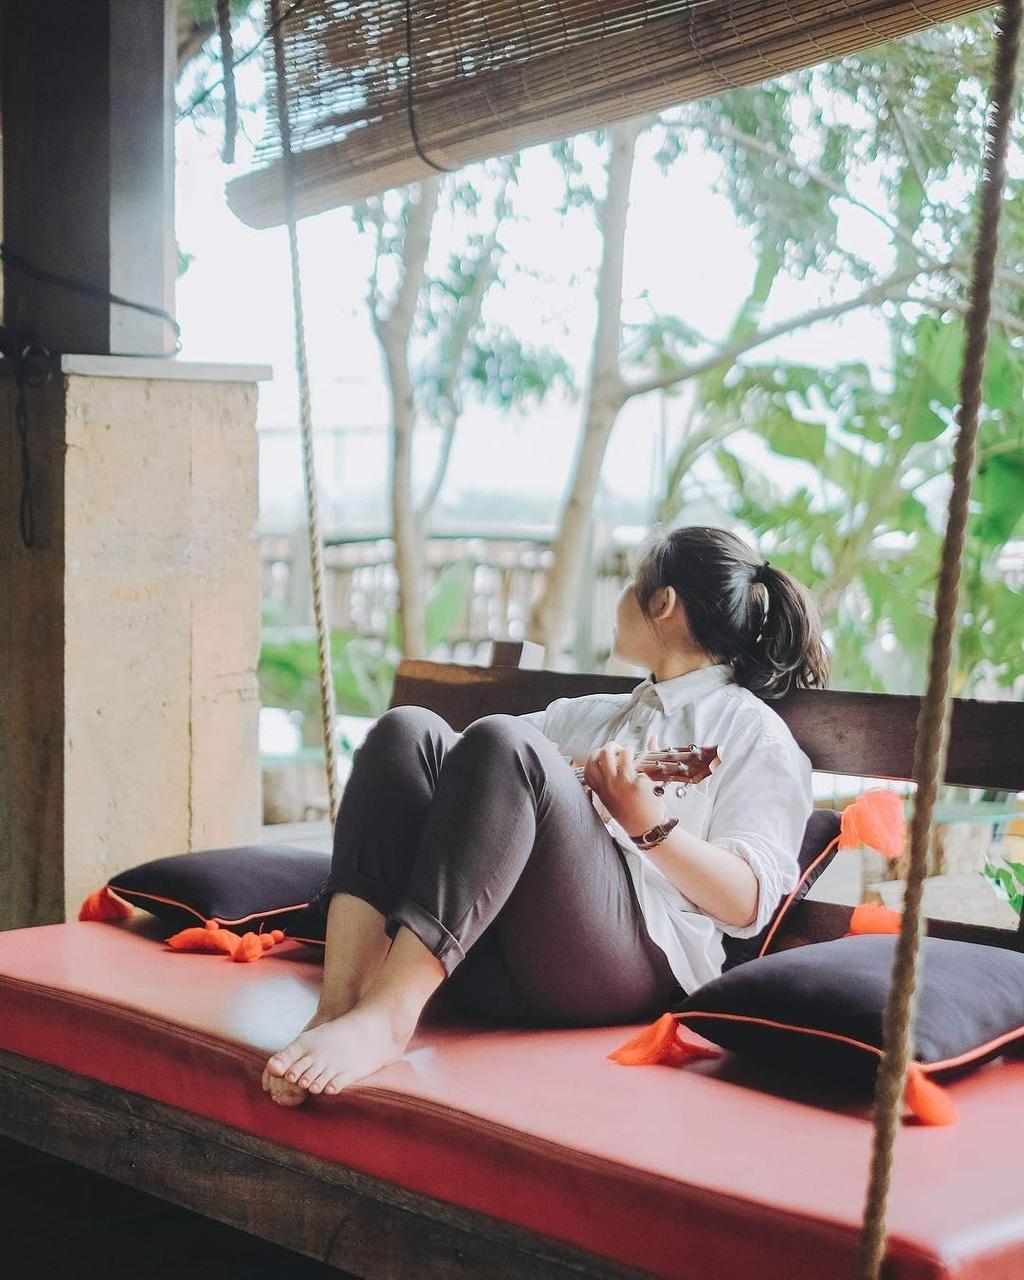 Cam trai kieu 'chanh sa' tai resort giua long rung nui Tay Nguyen hinh anh 19